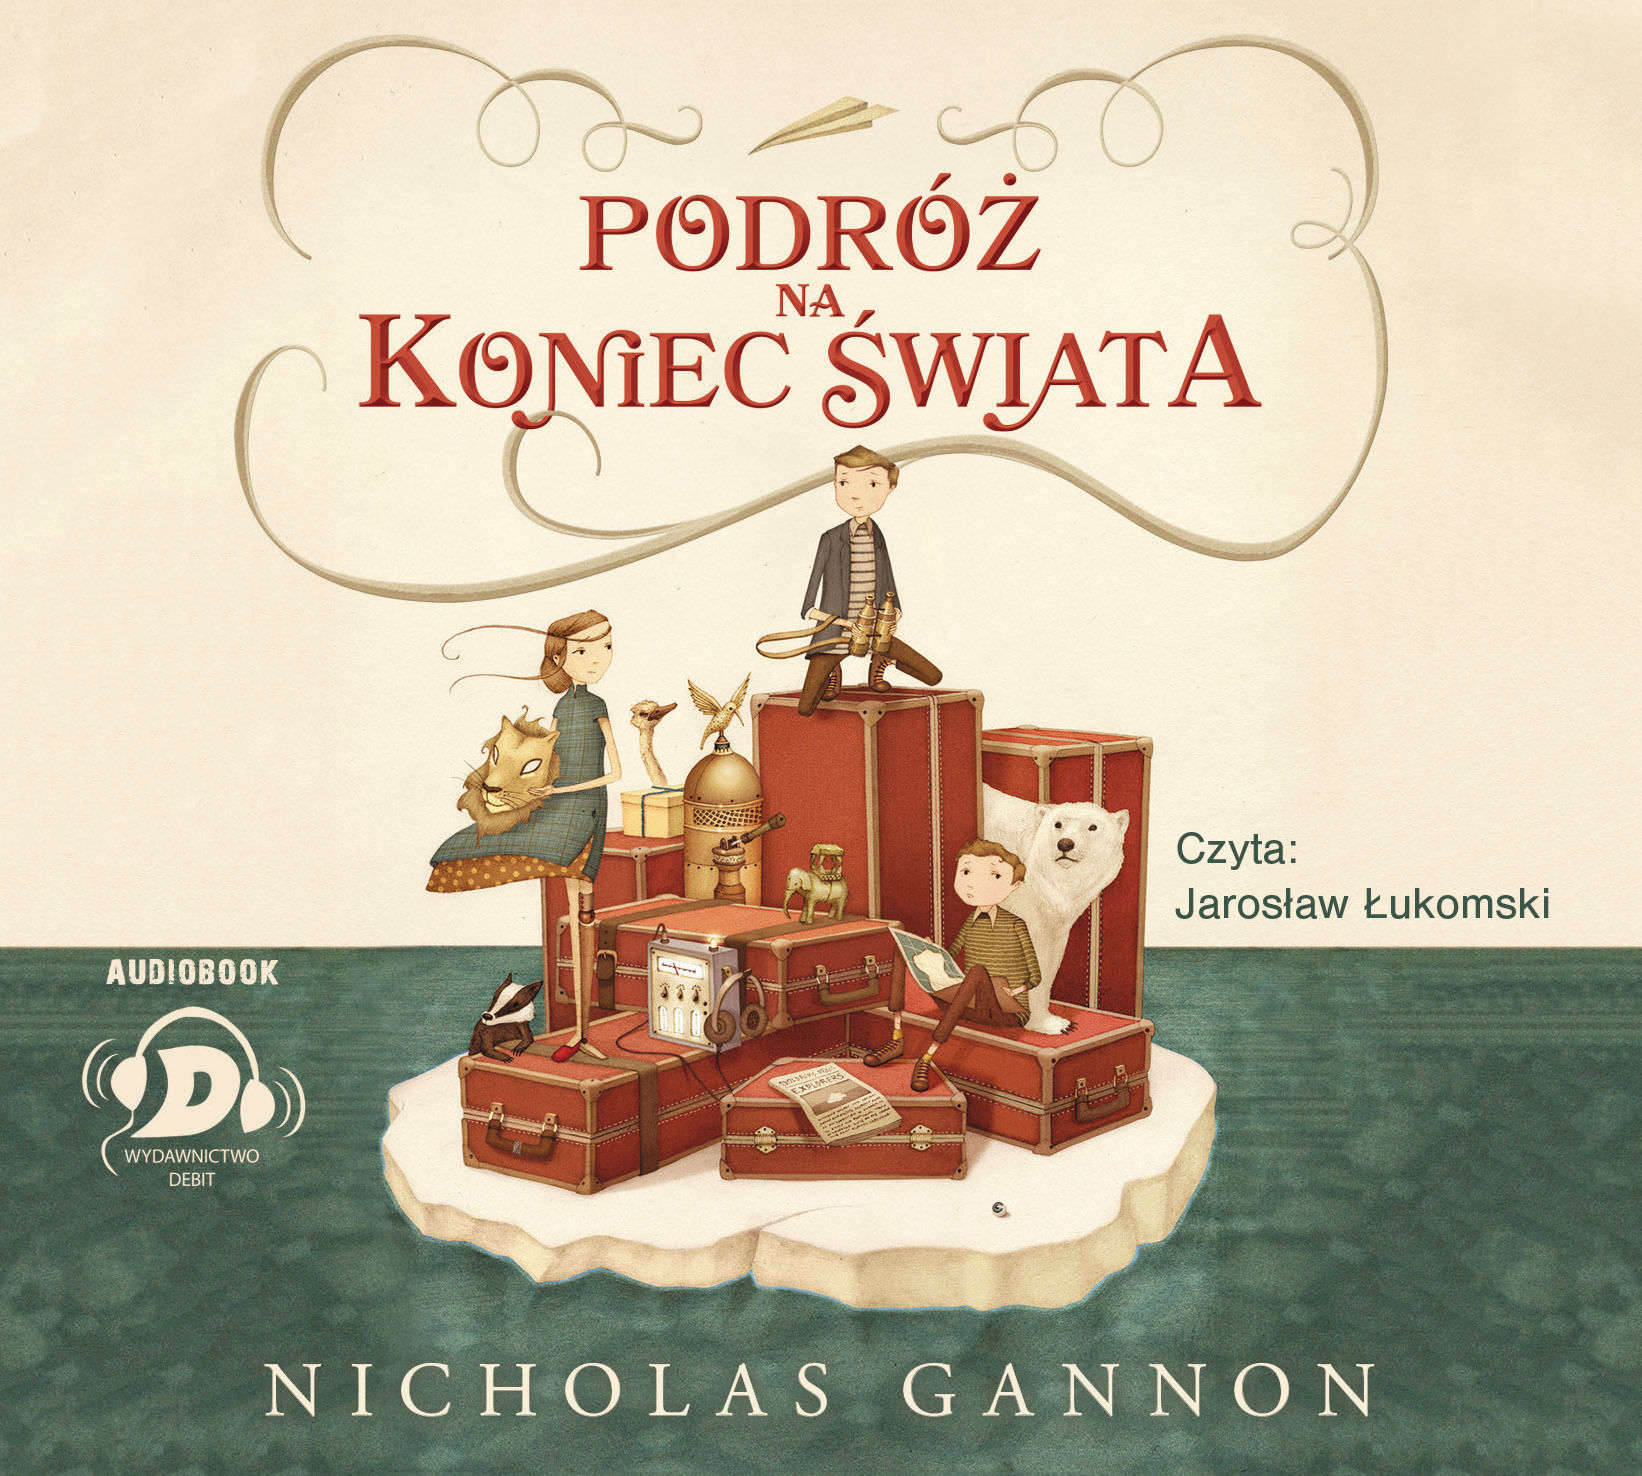 Podróż na koniec świata - Nicholas Gannon - audiobook